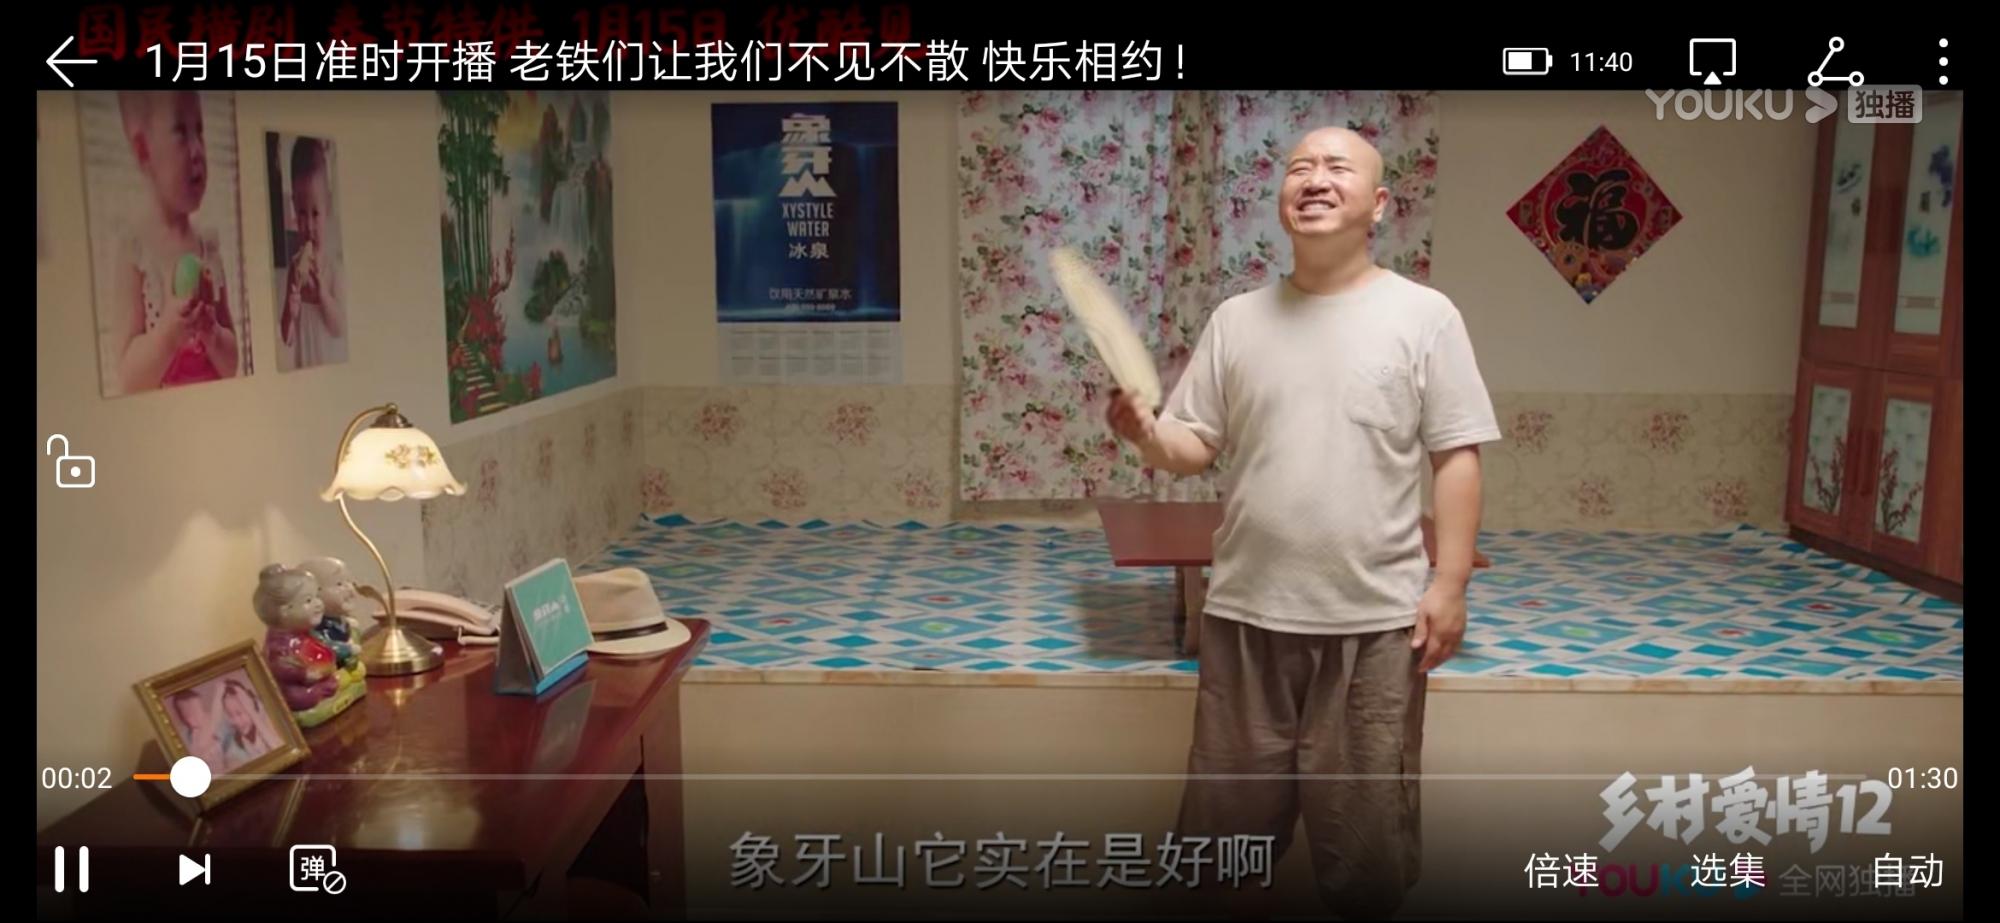 Screenshot_20200114_114008_com.huawei.himovie.jpg